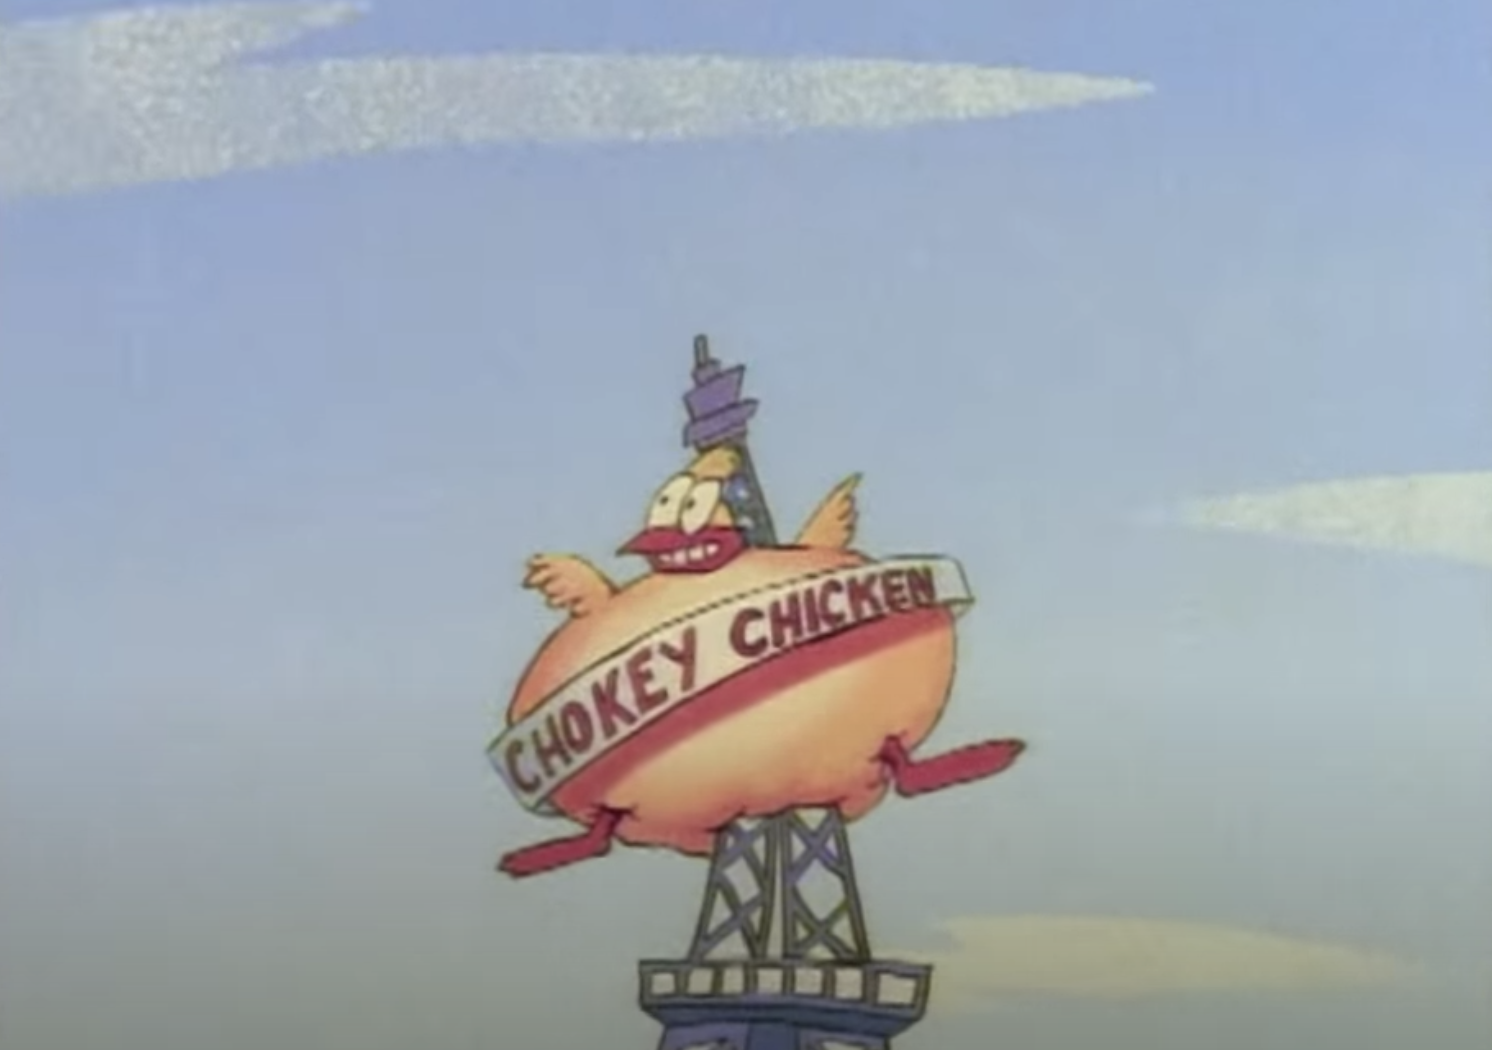 The Chokey Chicken restaurant sign